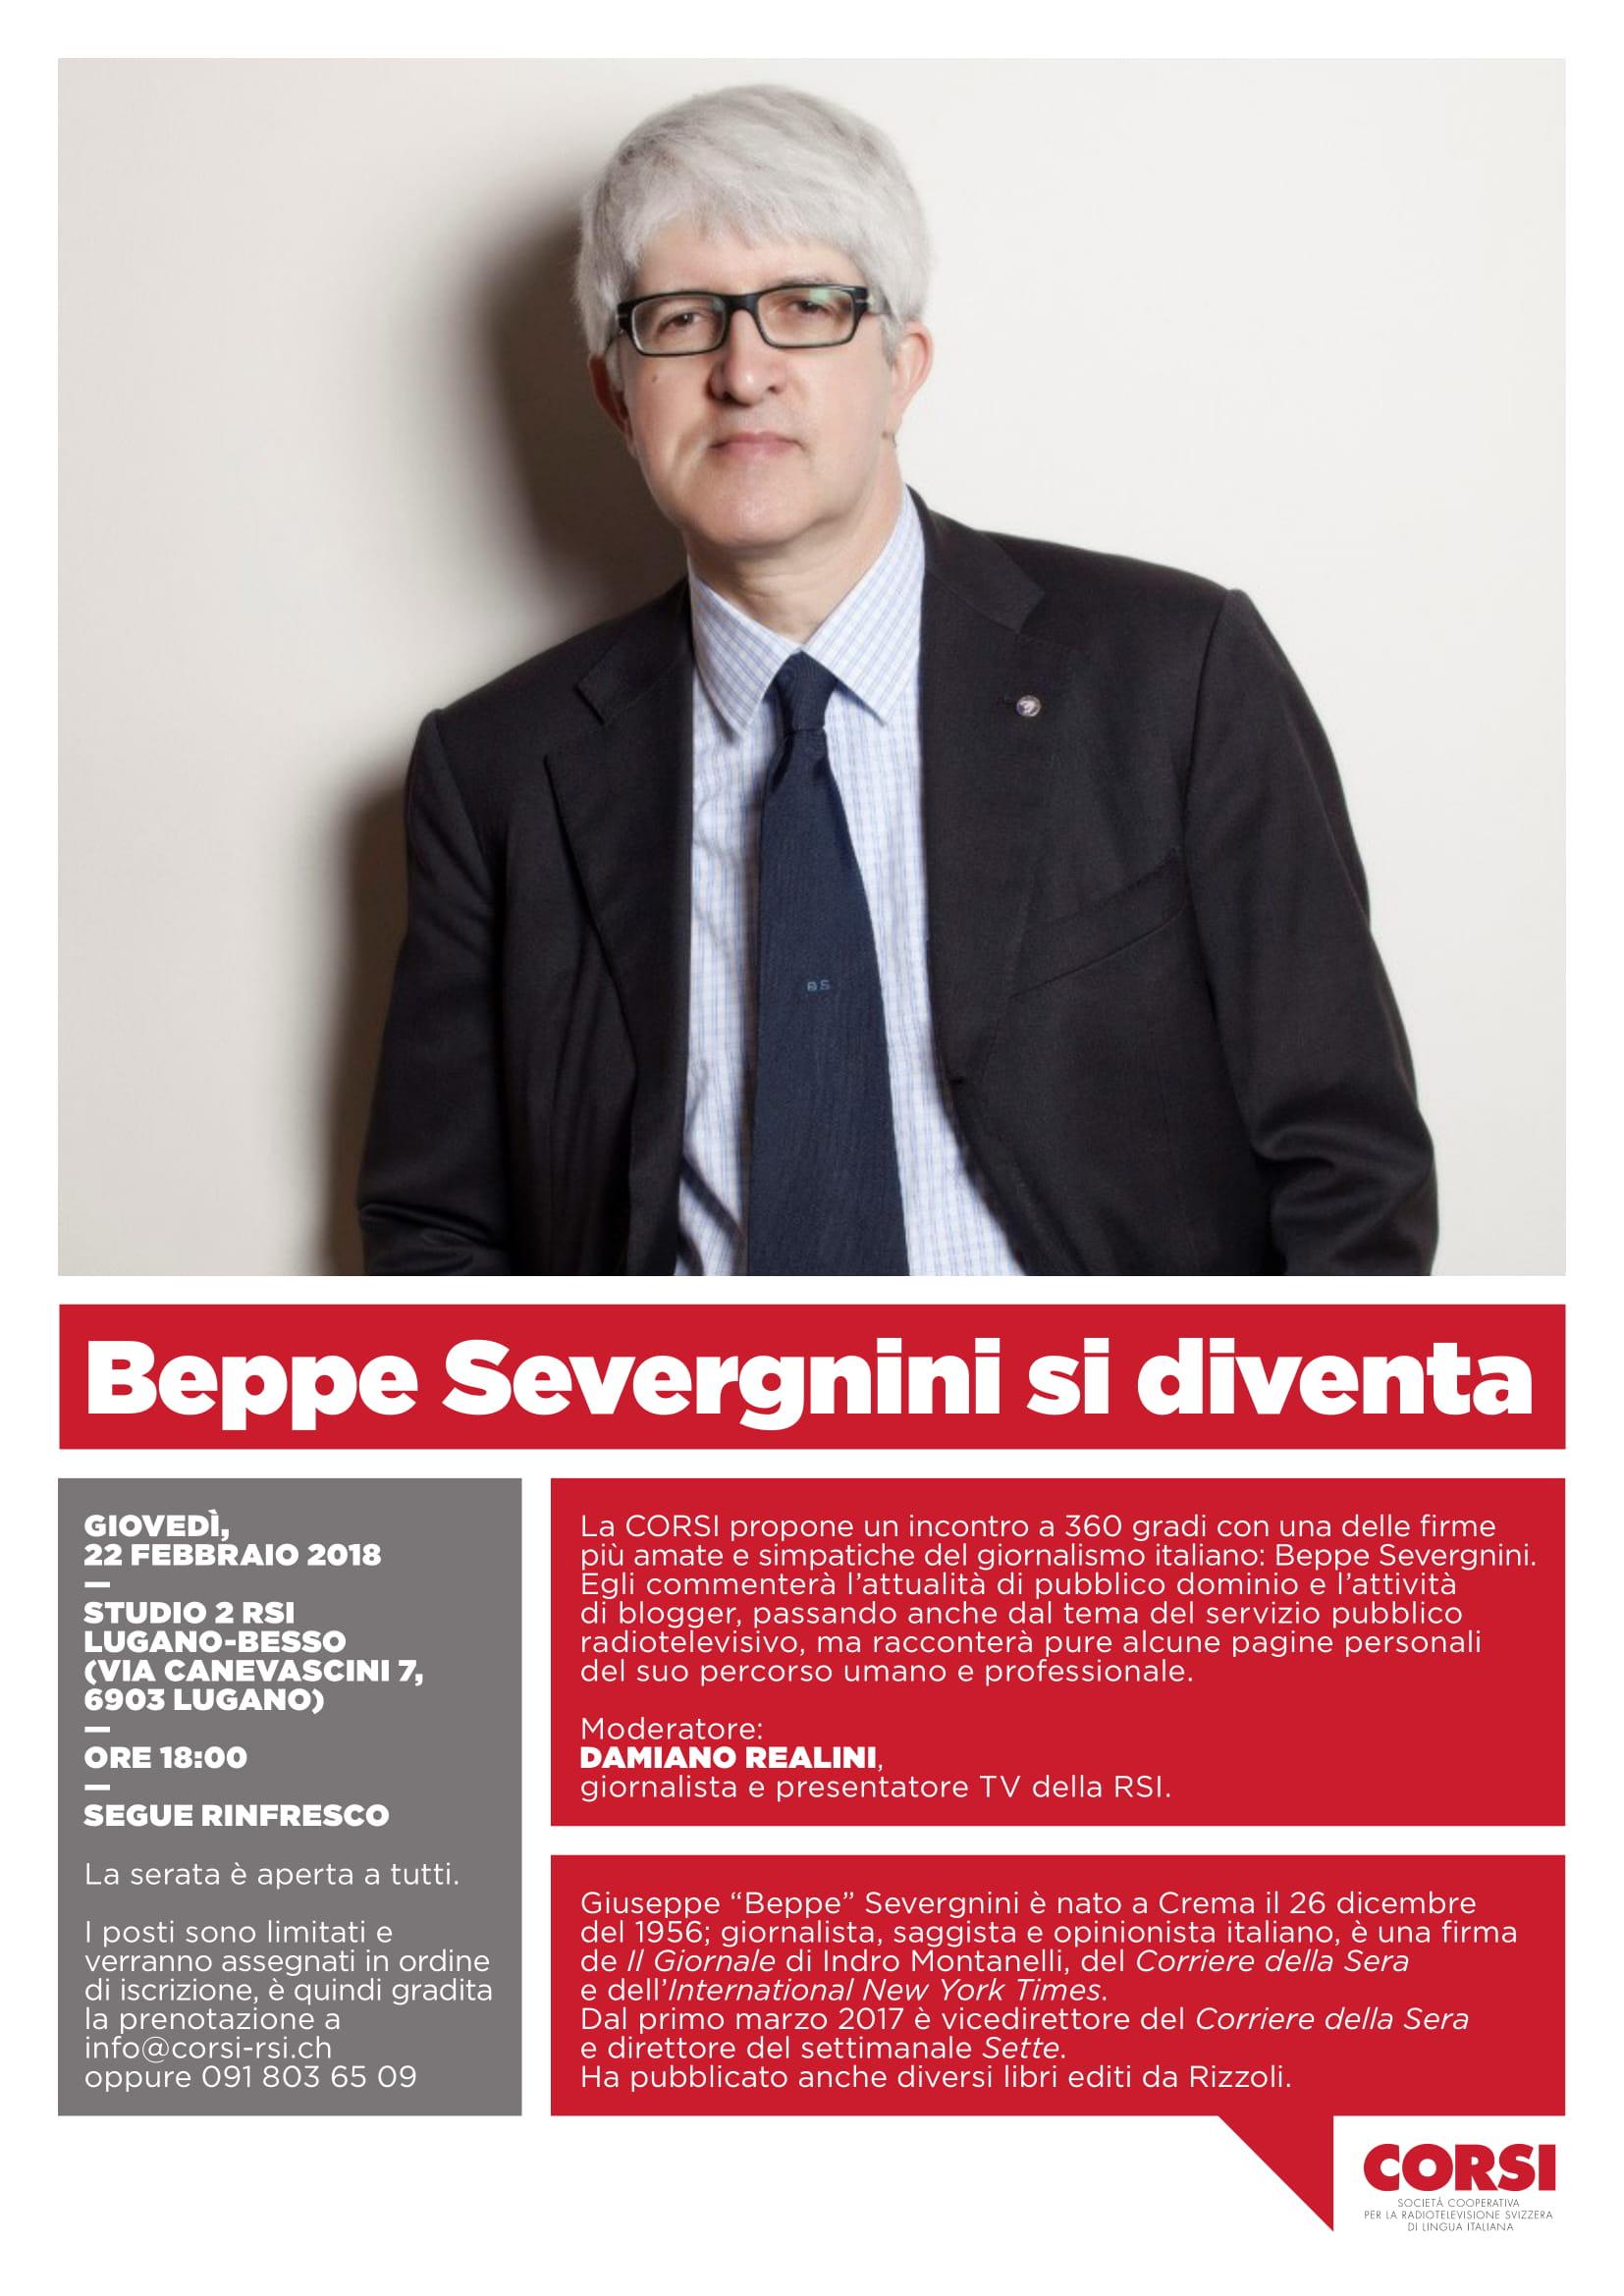 Locandina_Beppe_Severgnini_si_diventa-1.jpg